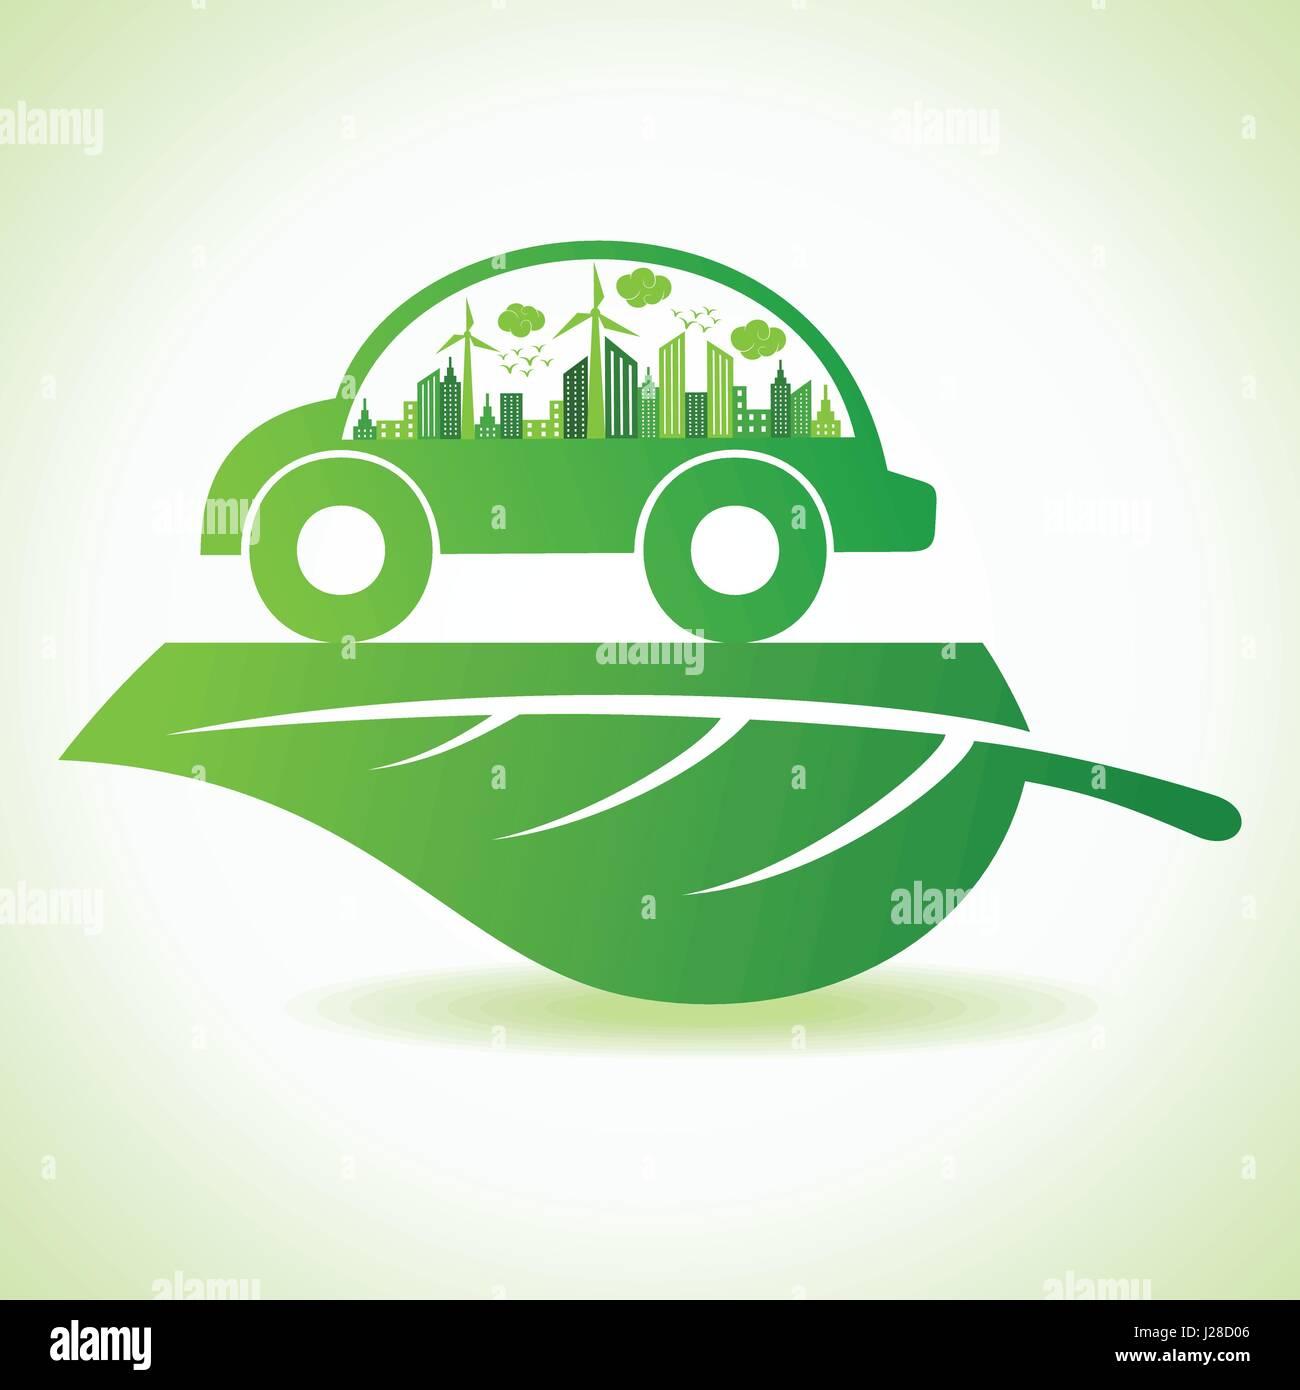 Save Environment Concept Stock Vector Stock Vector Image Art Alamy